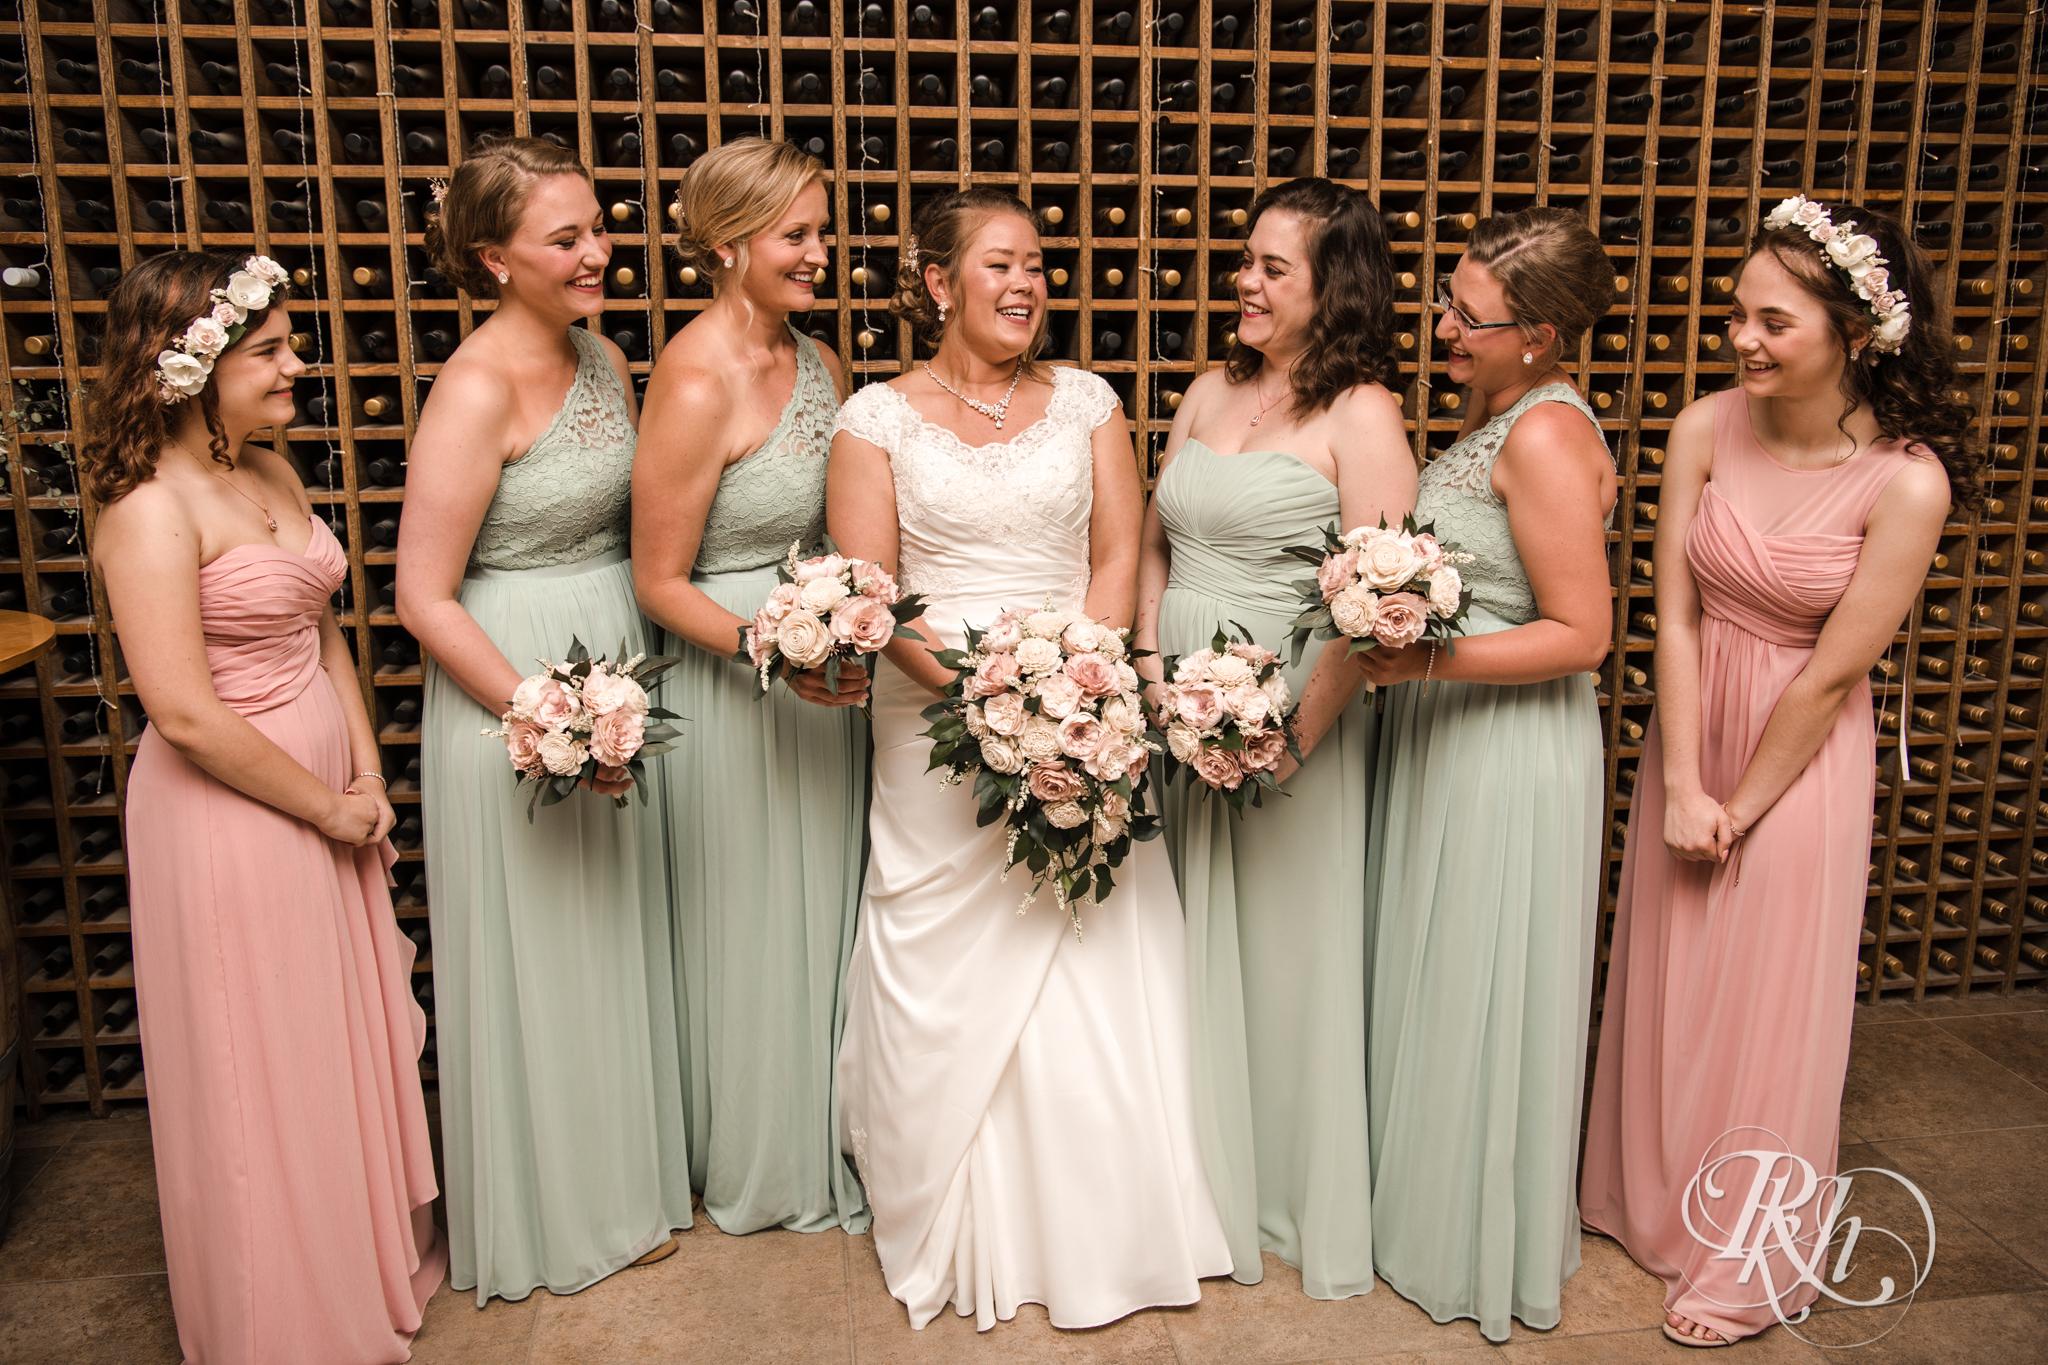 Ally & Nick - Minnesota Wedding Photography - Next Chapter Winery - RKH Images - Blog (26 of 57).jpg